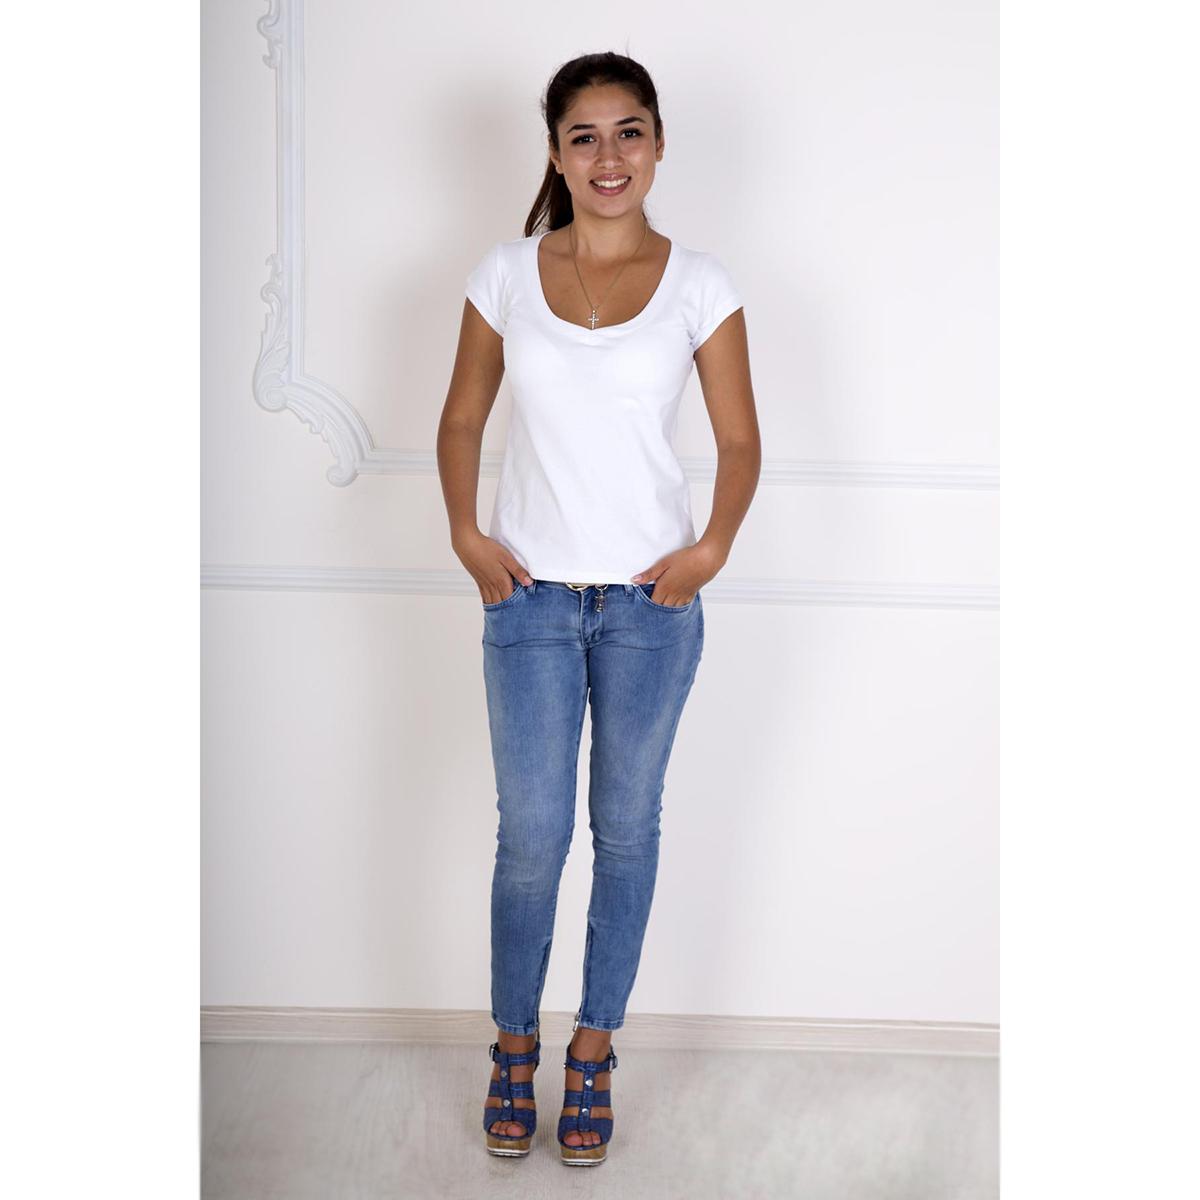 Женская футболка Лиза Белый, размер 48Блузки, майки, кофты<br>Обхват груди:96 см<br>Обхват талии:78 см<br>Обхват бедер:104 см<br>Длина по спинке:54 см<br>Рост:167 см<br><br>Тип: Жен. футболка<br>Размер: 48<br>Материал: Фулайкра